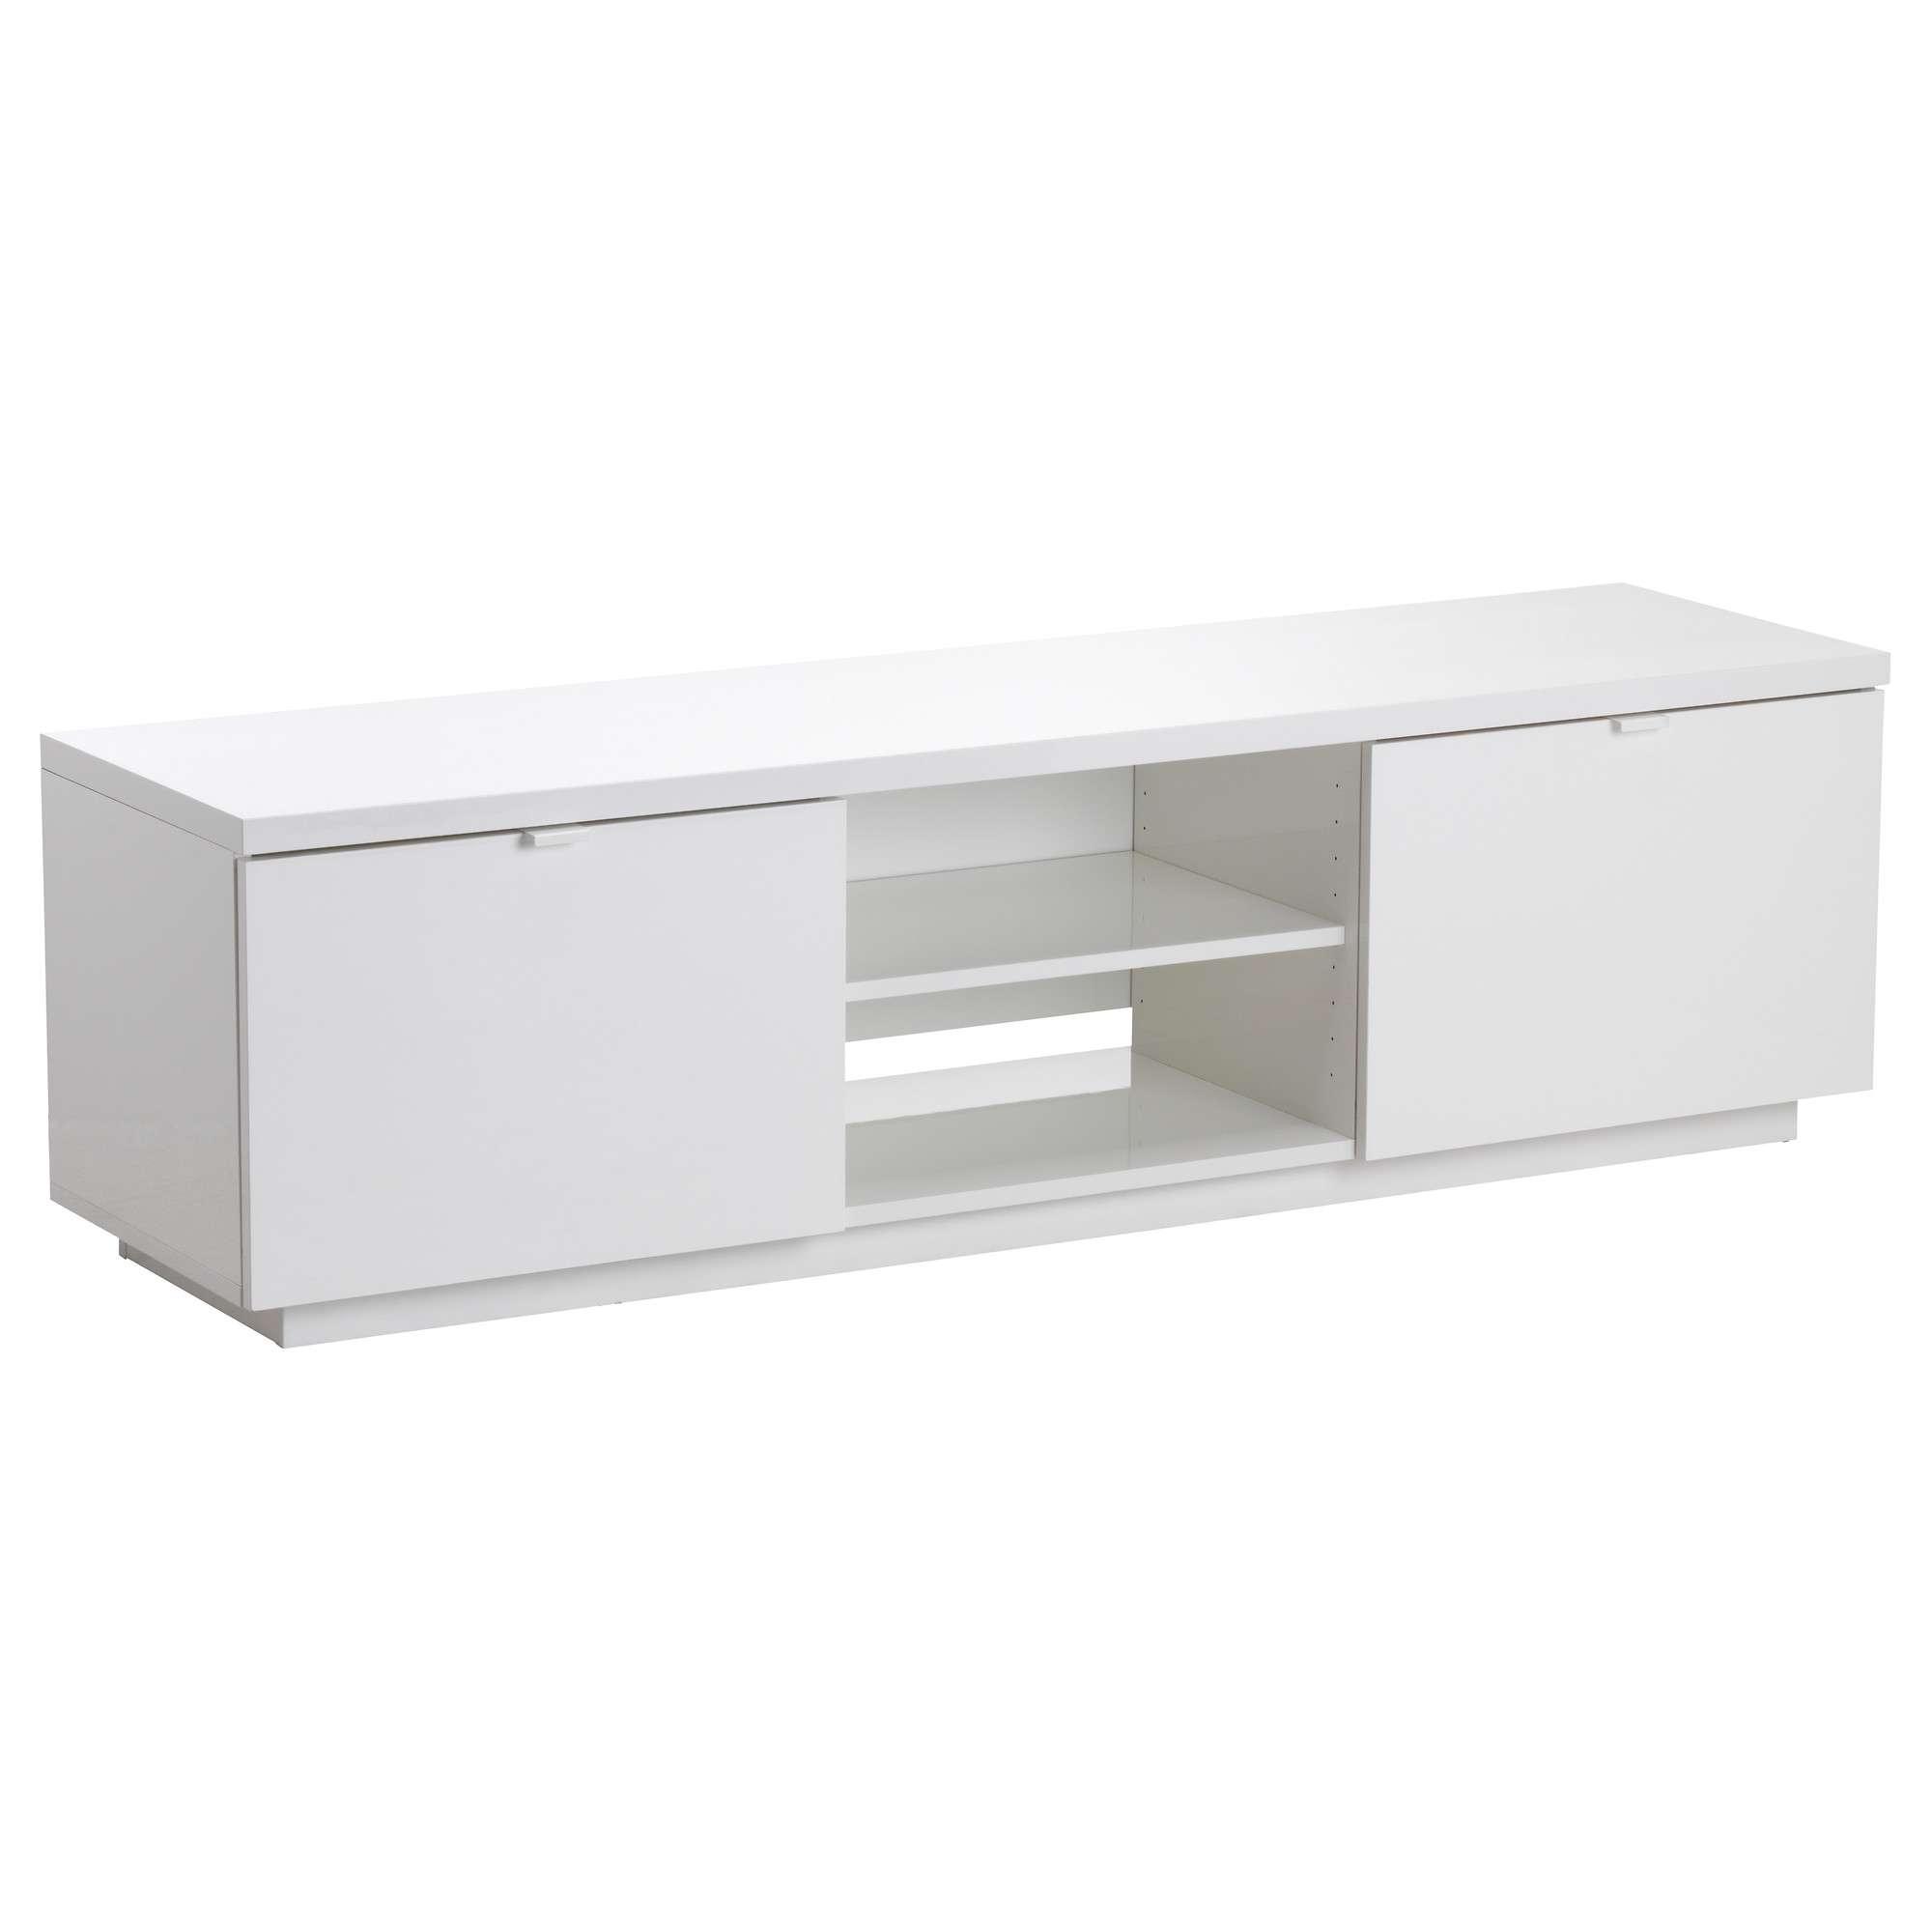 Byås Tv Bench High Gloss White 160x42x45 Cm – Ikea Regarding Long White Tv Cabinets (View 8 of 20)